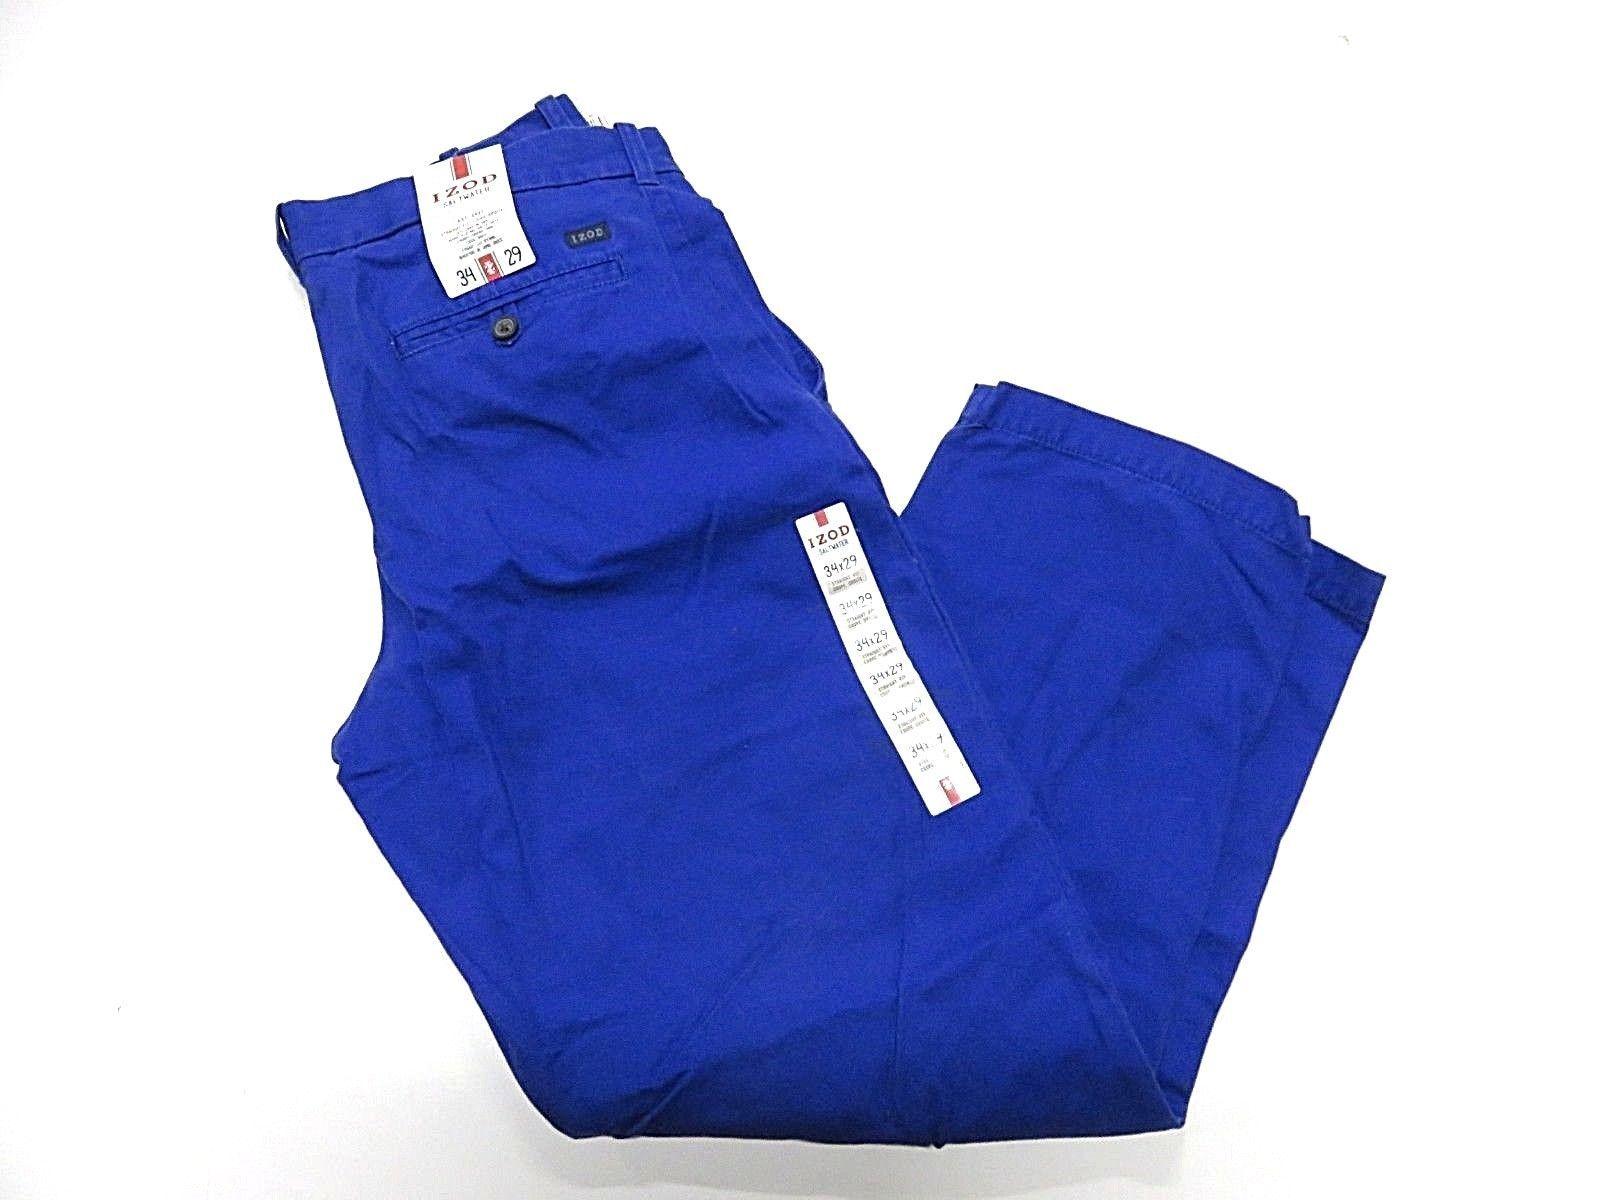 NOS w/ TAGS IZOD Saltwater Mazarine Blue Men's Straight Fit Pants Size W34 L29